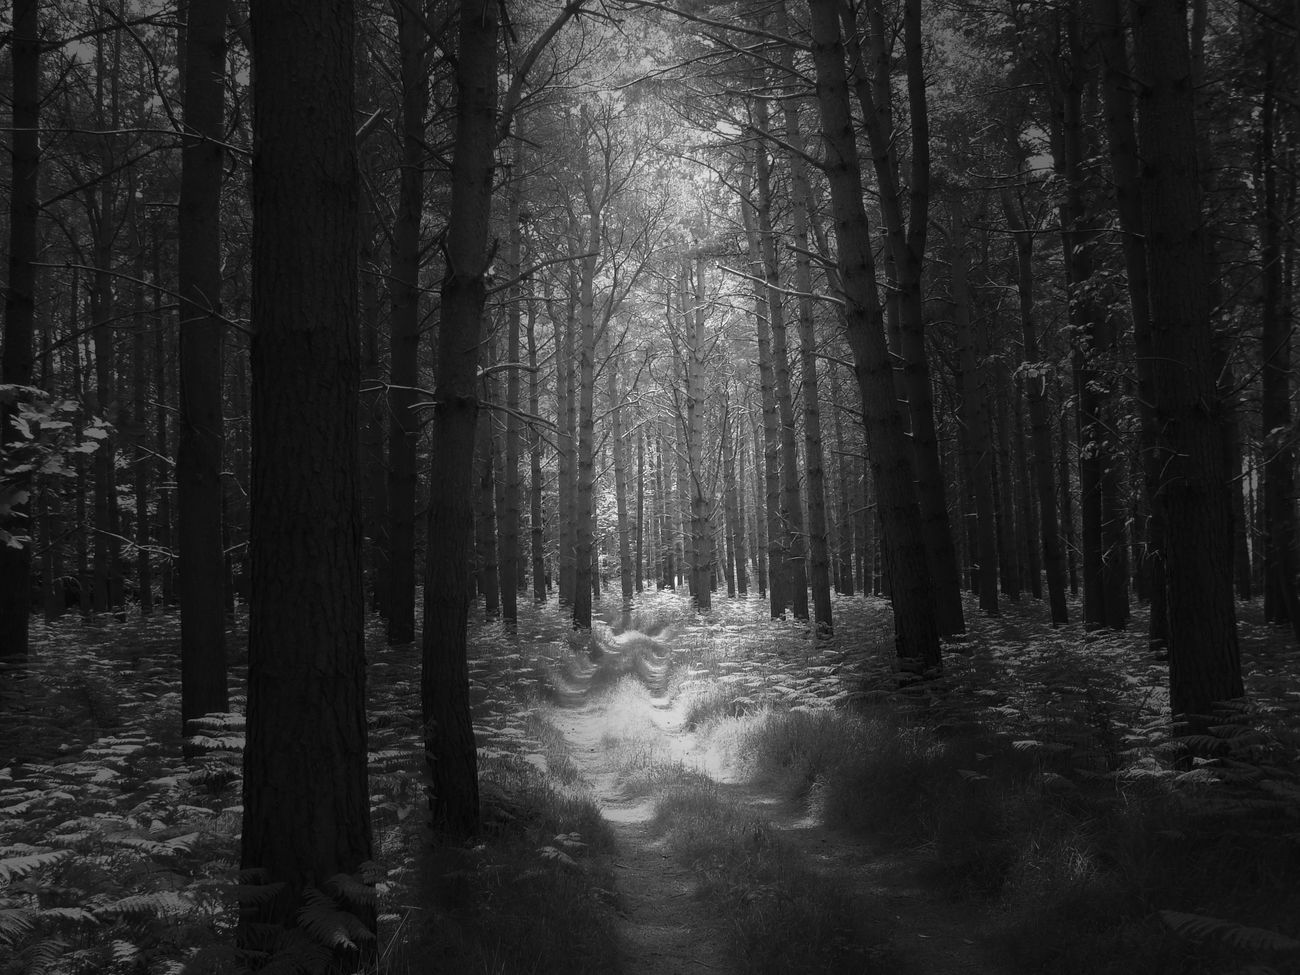 Blackandwhite Black And White Eye4photography  Monochrome